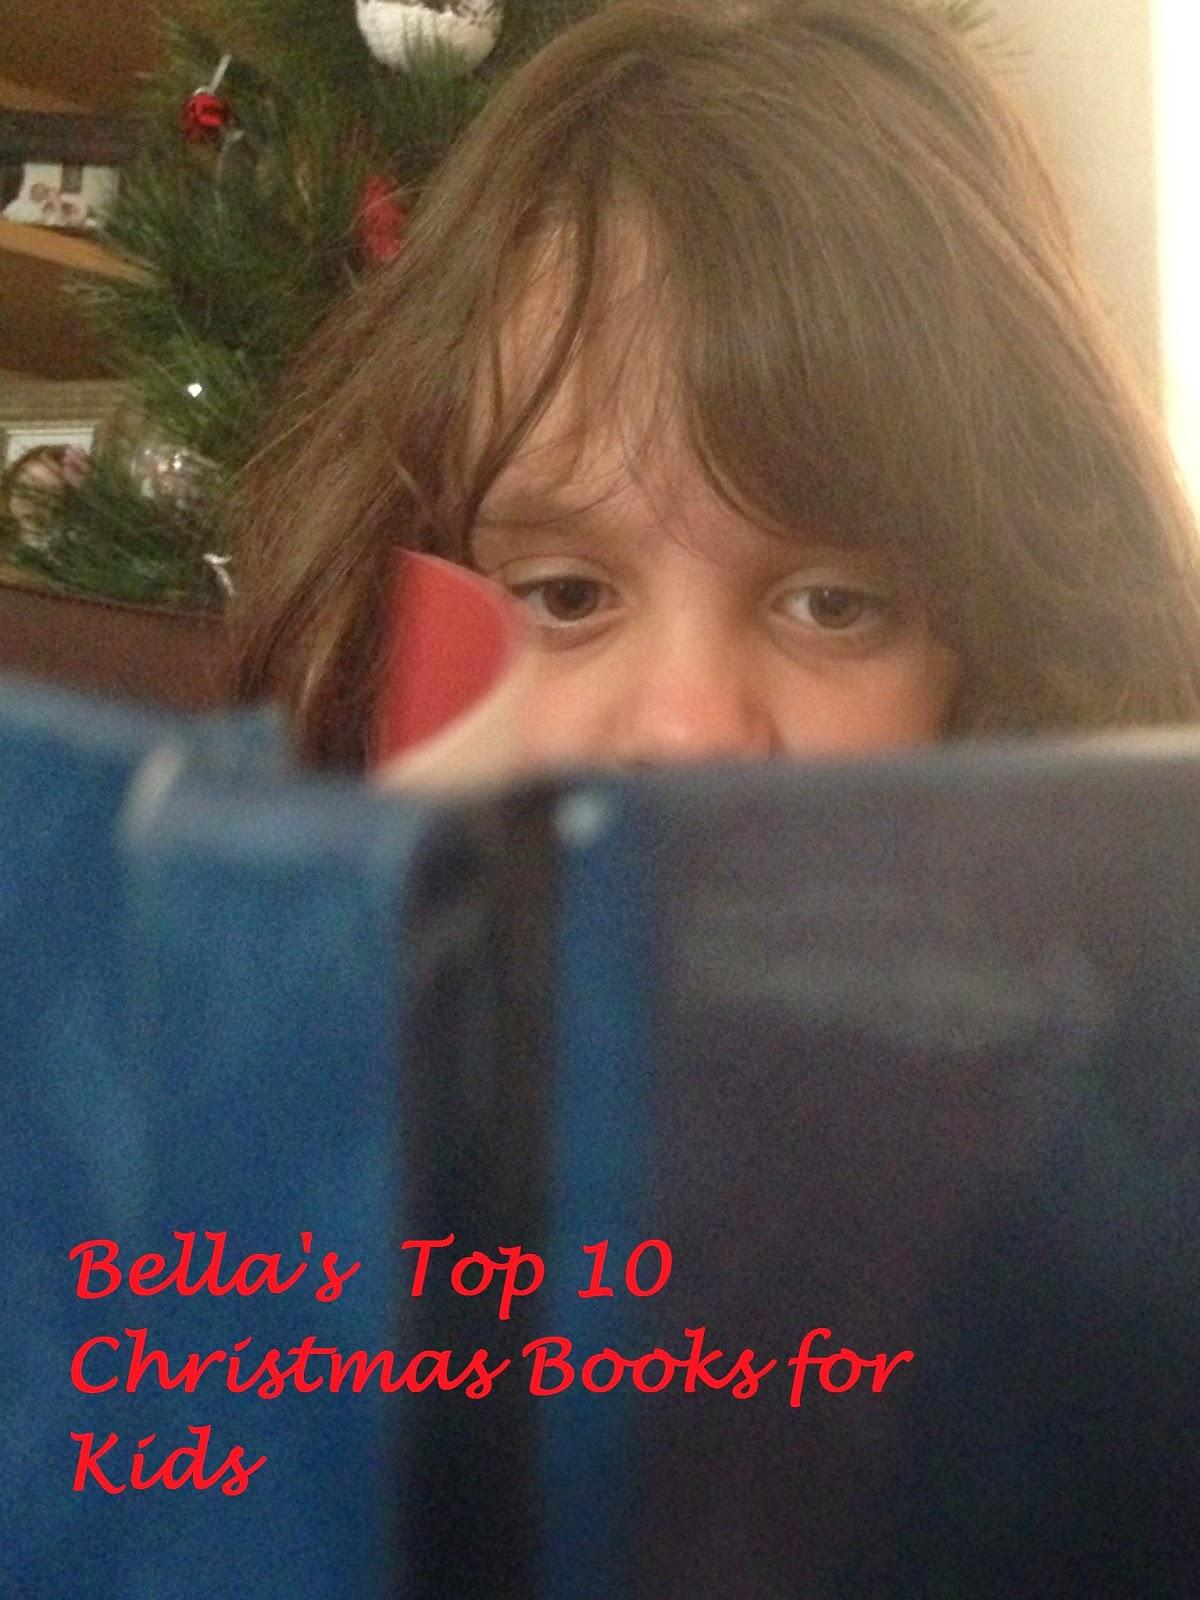 Bella's Top 10 Christmas Books for Children